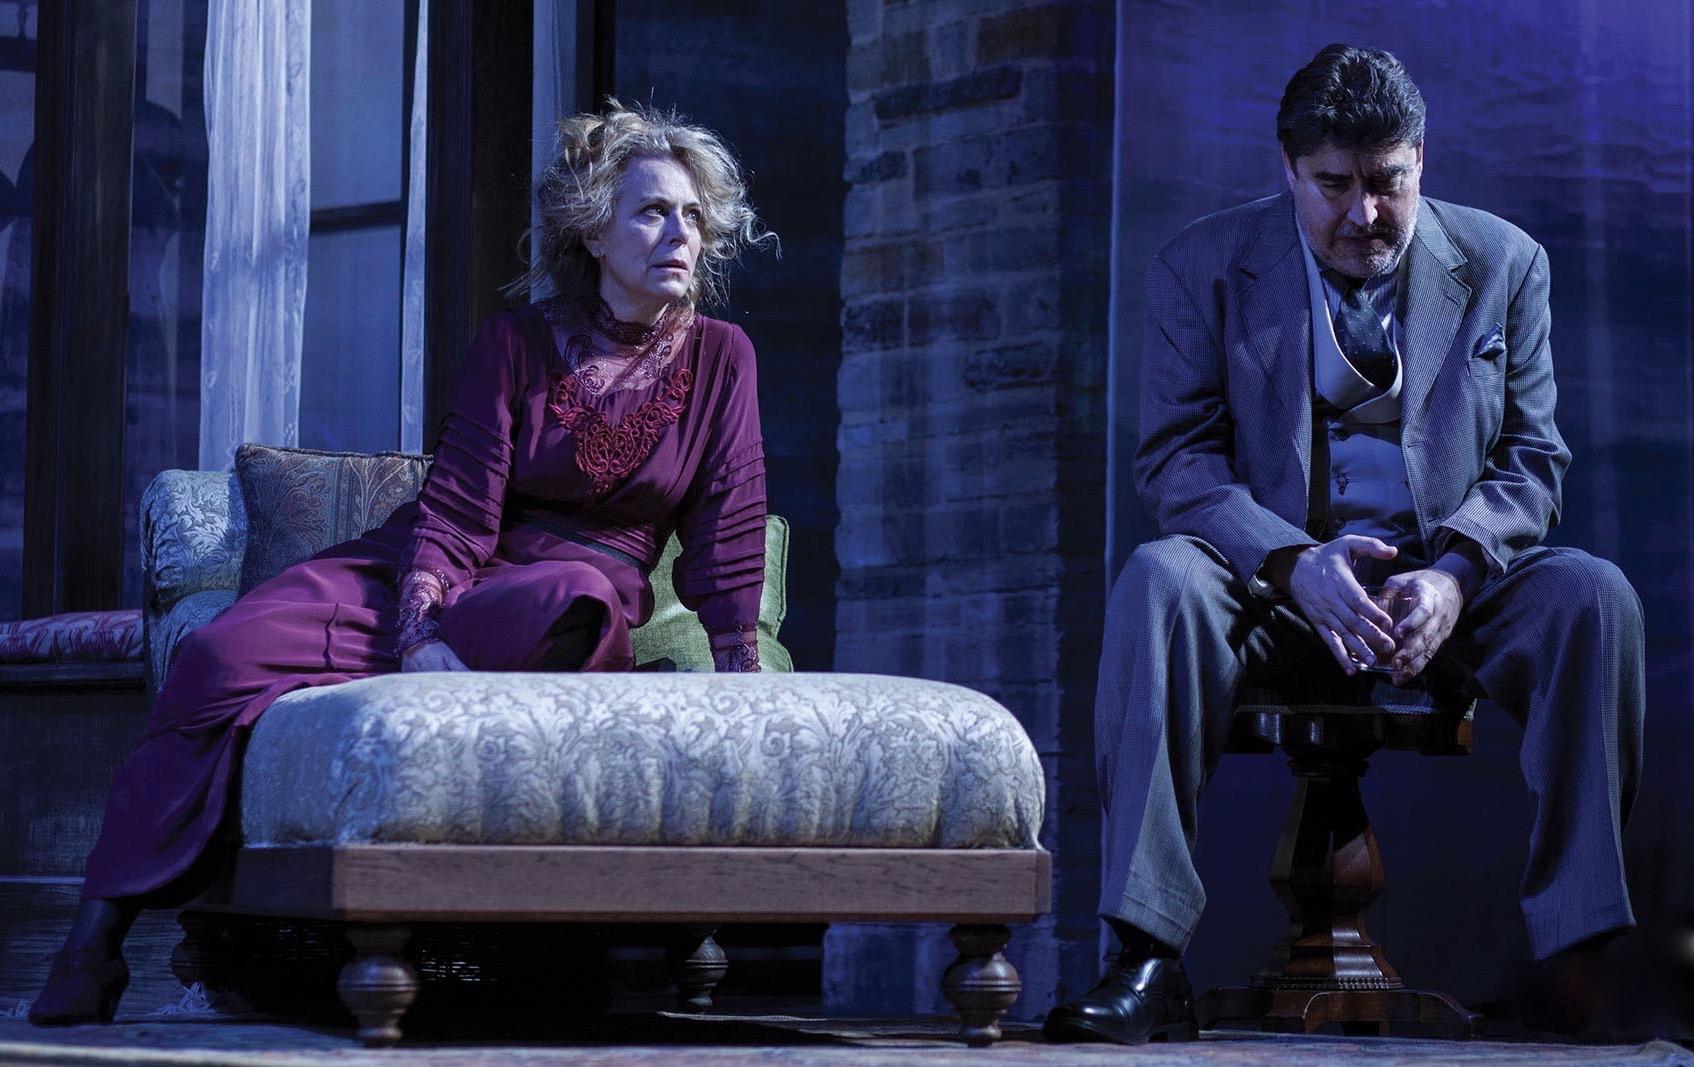 jane Kaczmarek & alfred molina as mary & james tyrone @ the geffen playhouse